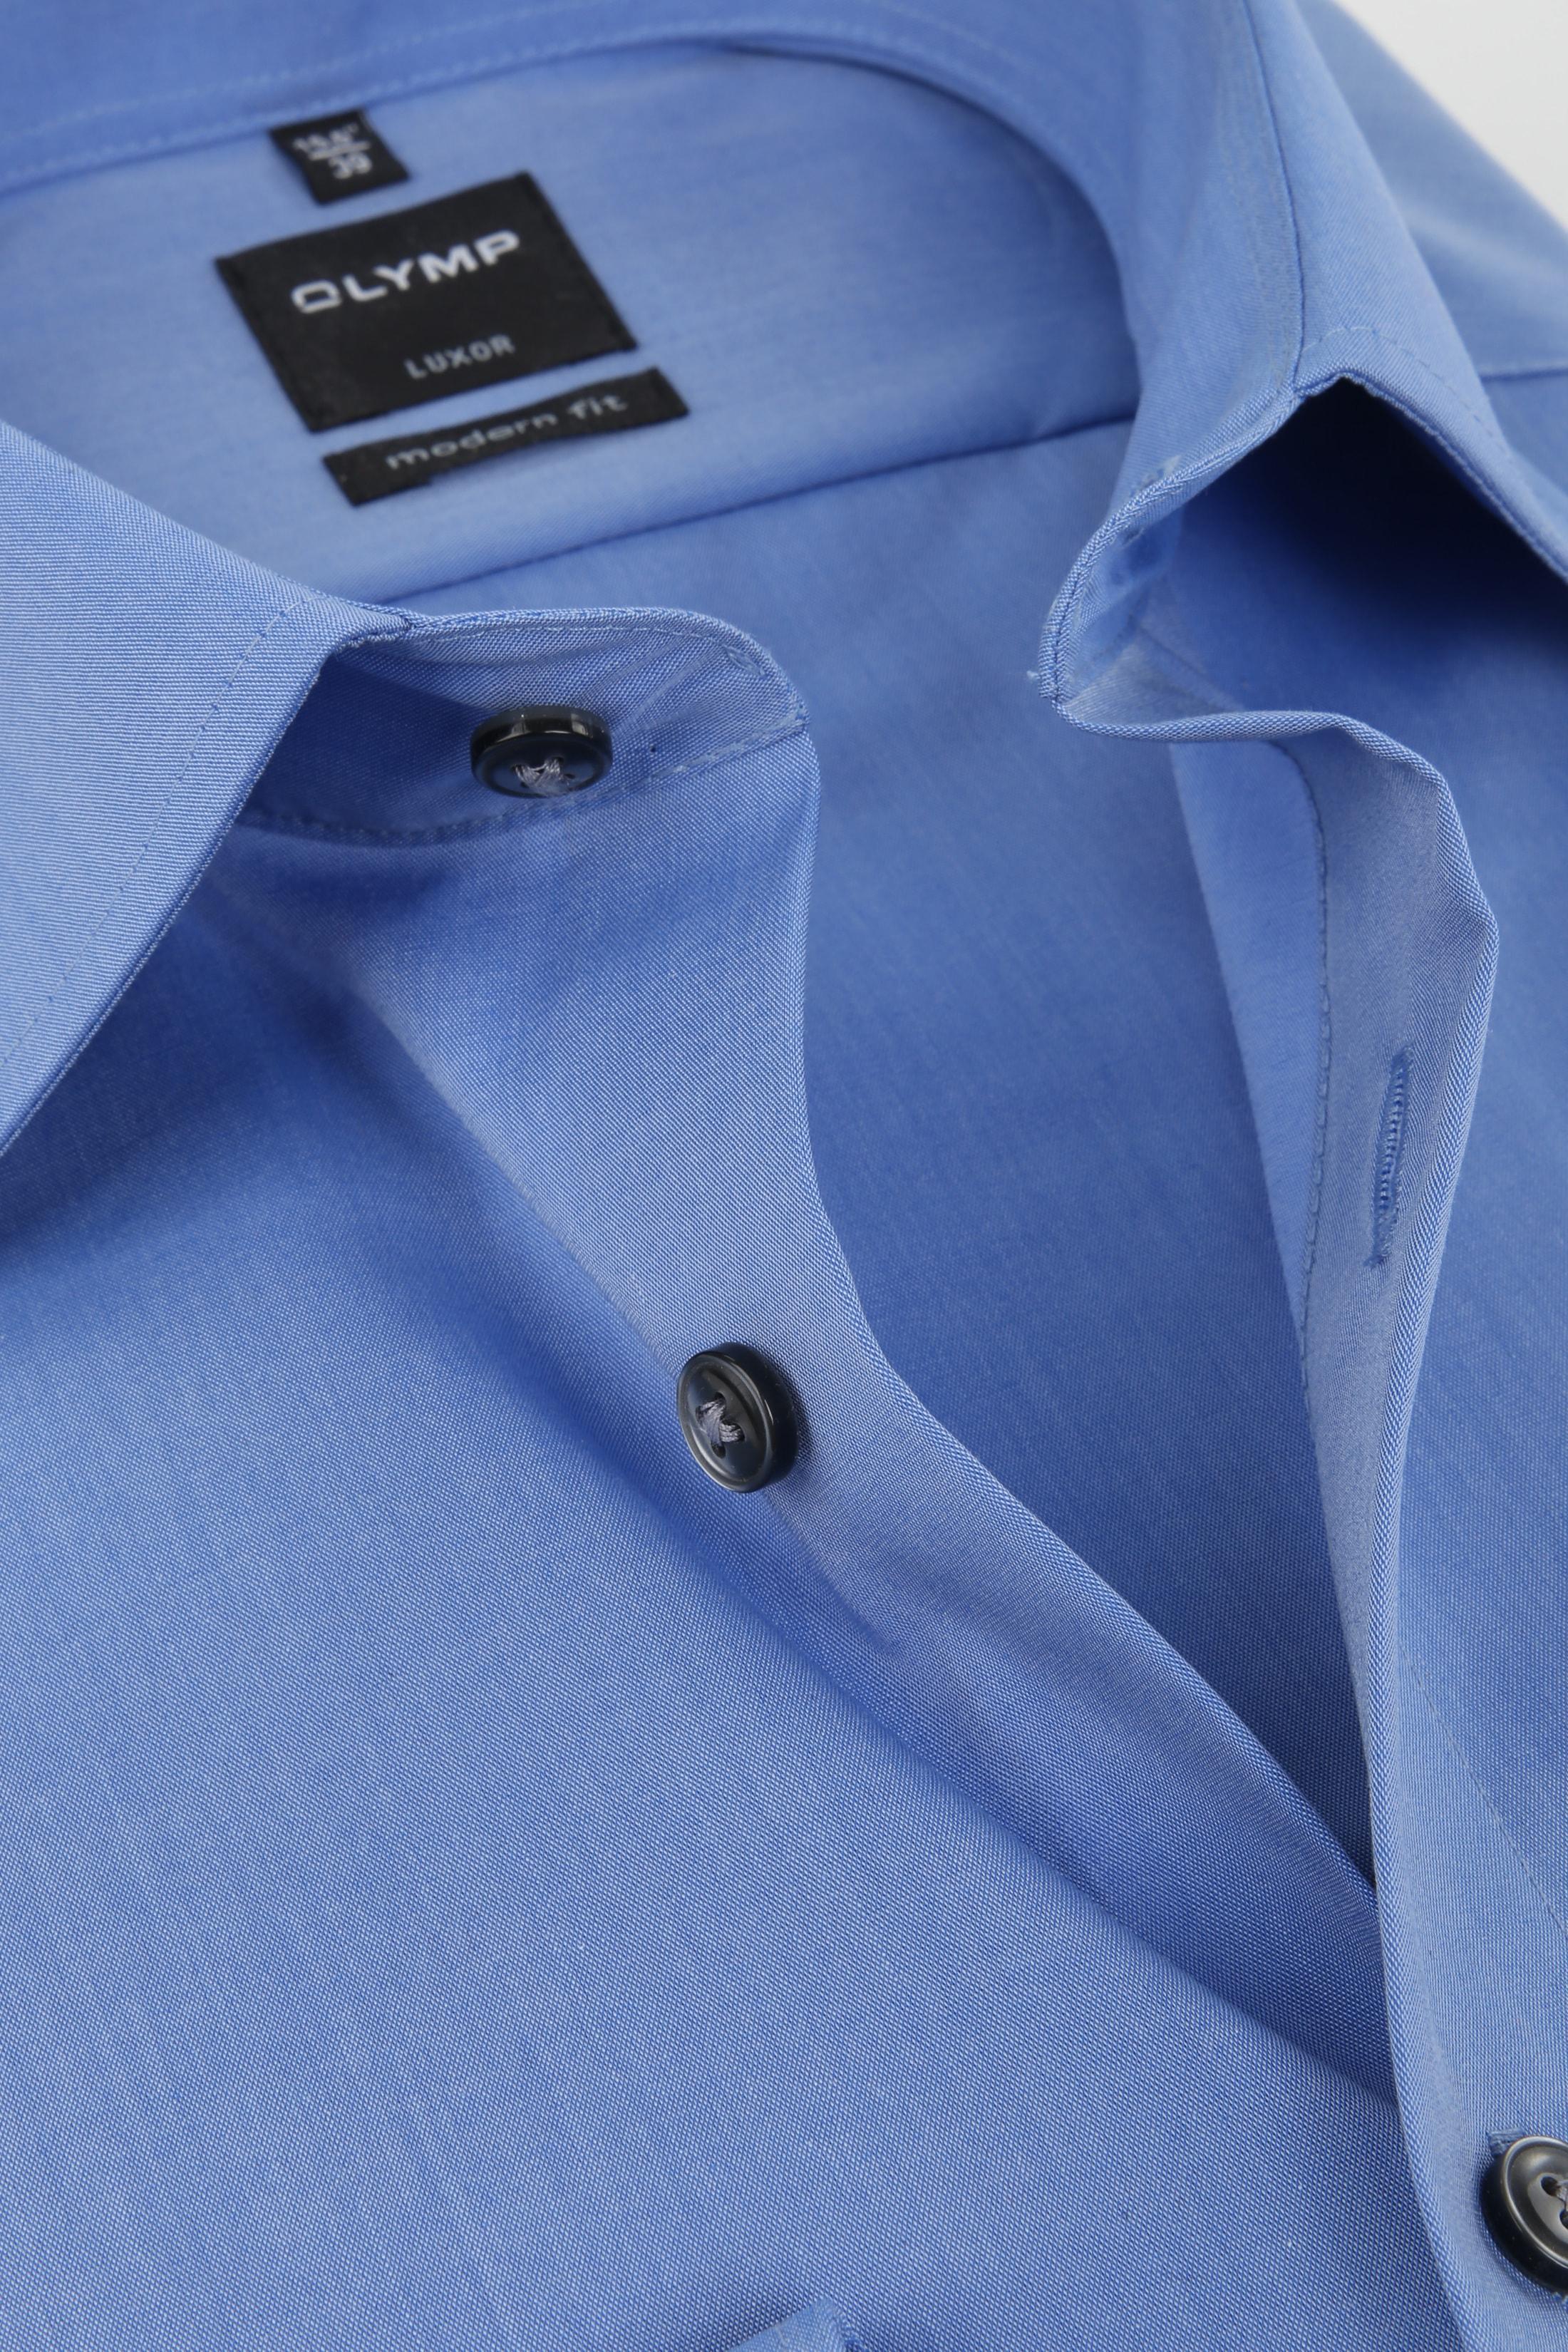 OLYMP Overhemd SL7 Blauw Chambray foto 1